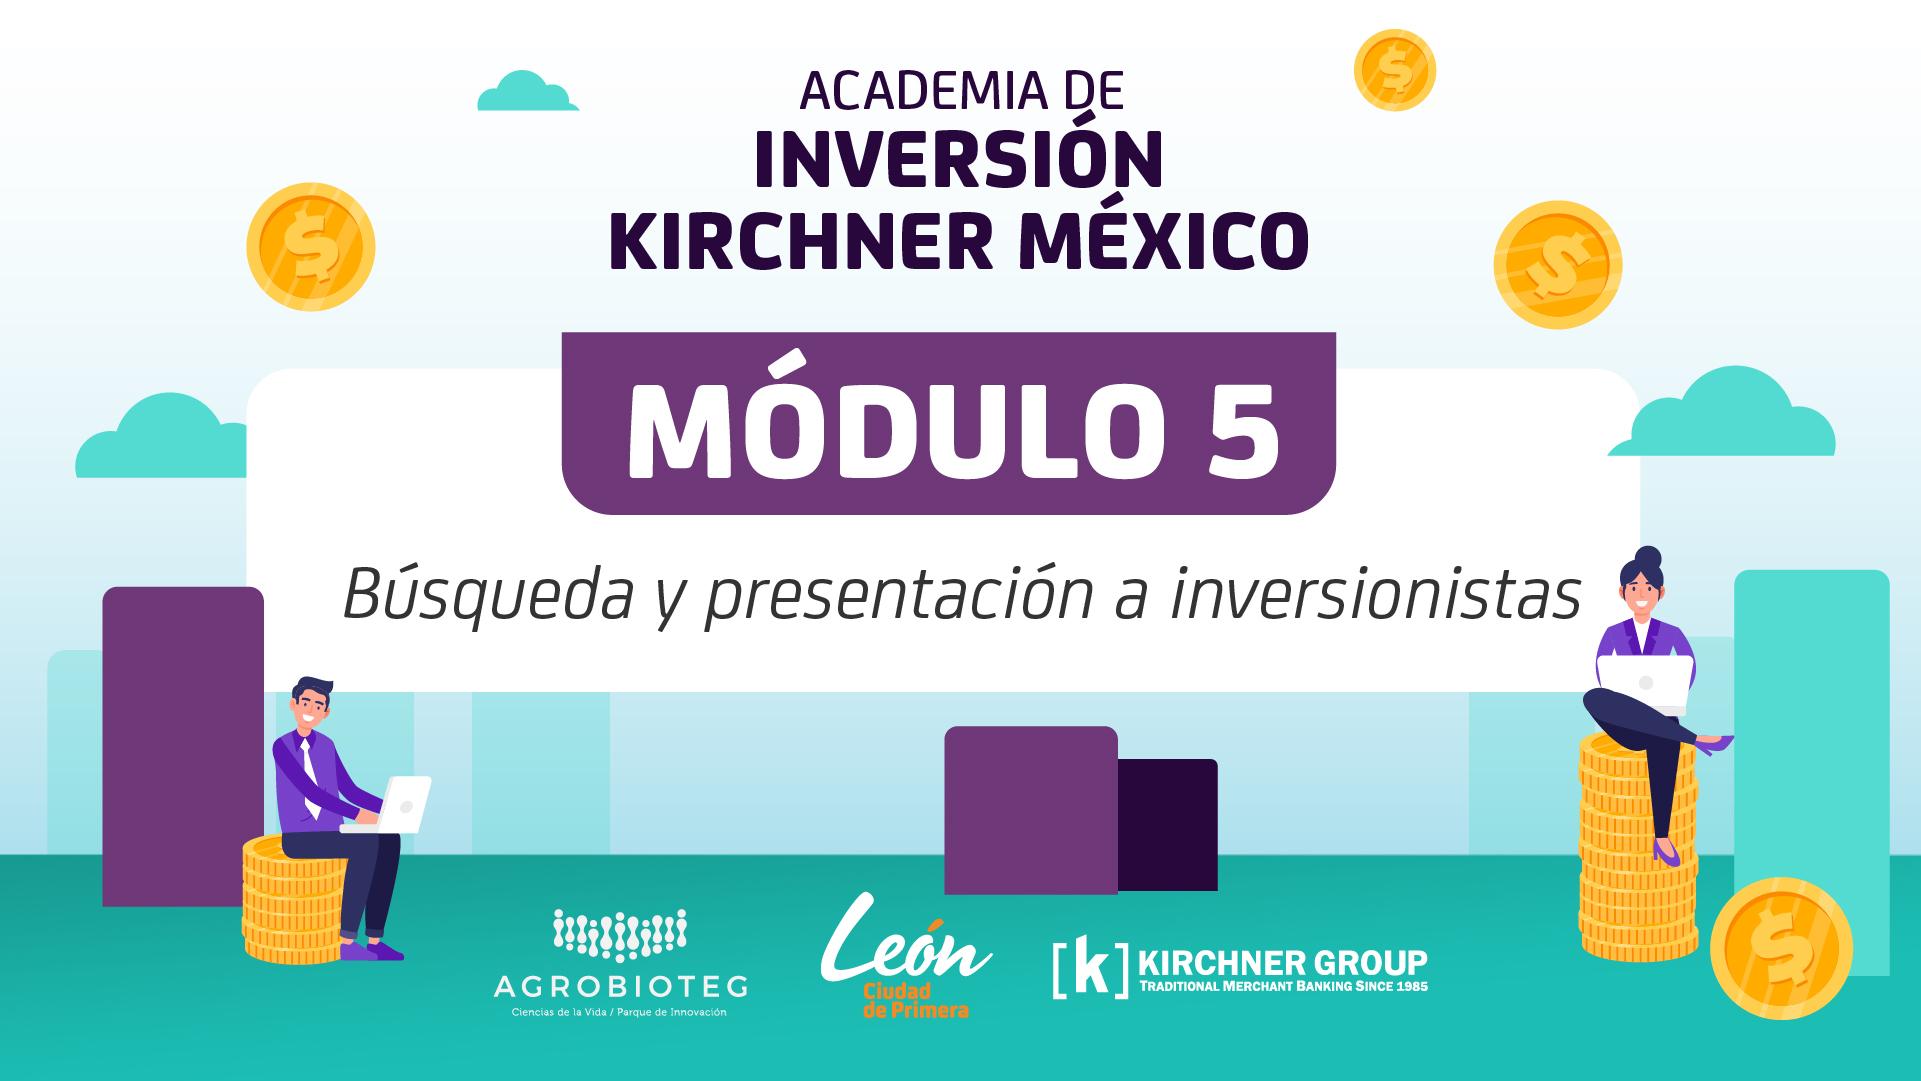 ACADEMIA DE INVERSION_MODULO5